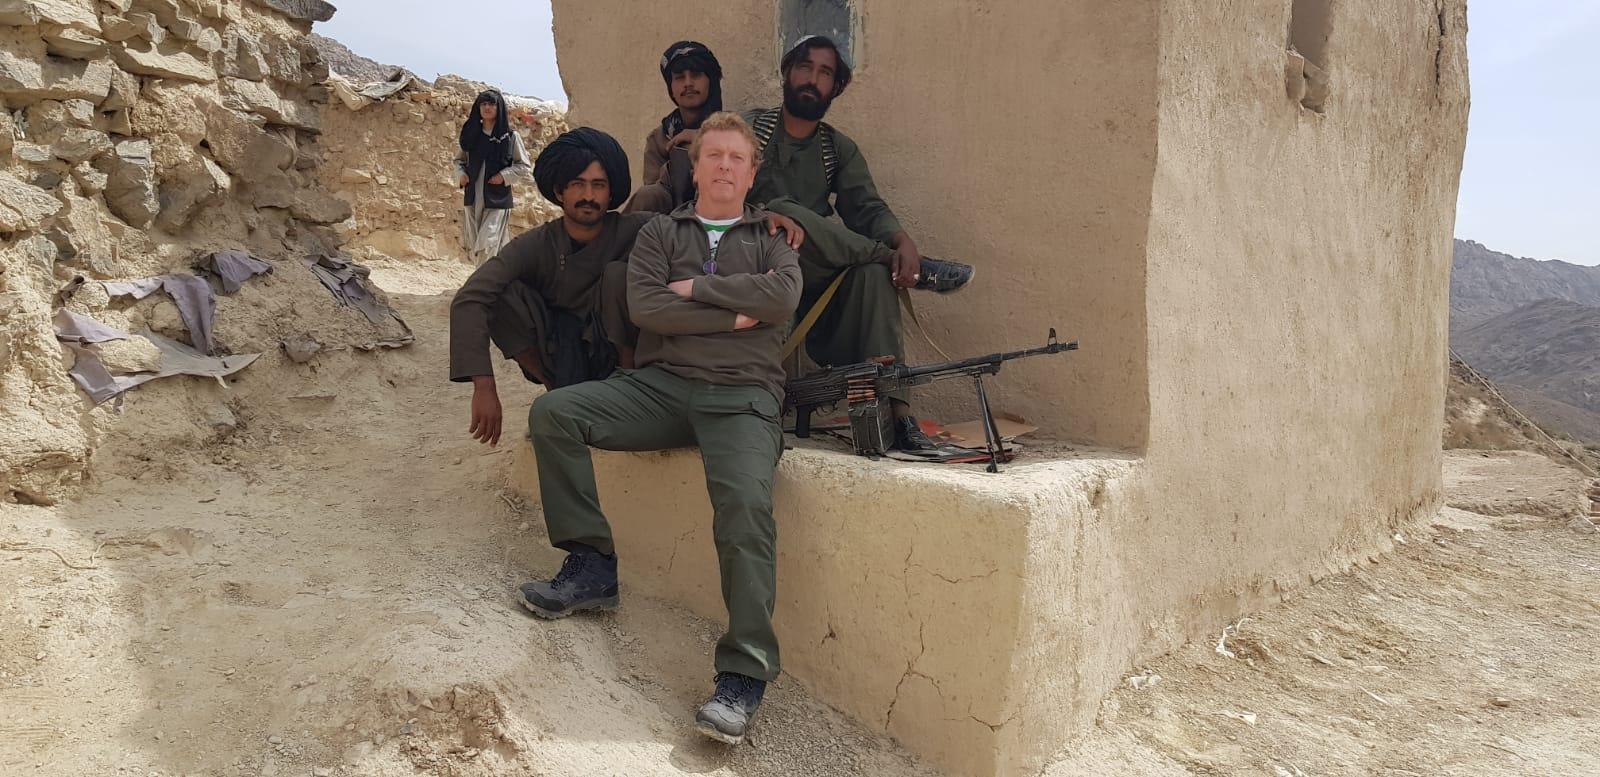 FOOTBALL FOCUS: Filmmaker Jamie Doran, sporting a Celtic top beneath his tunic, with his Taliban \'guards\'